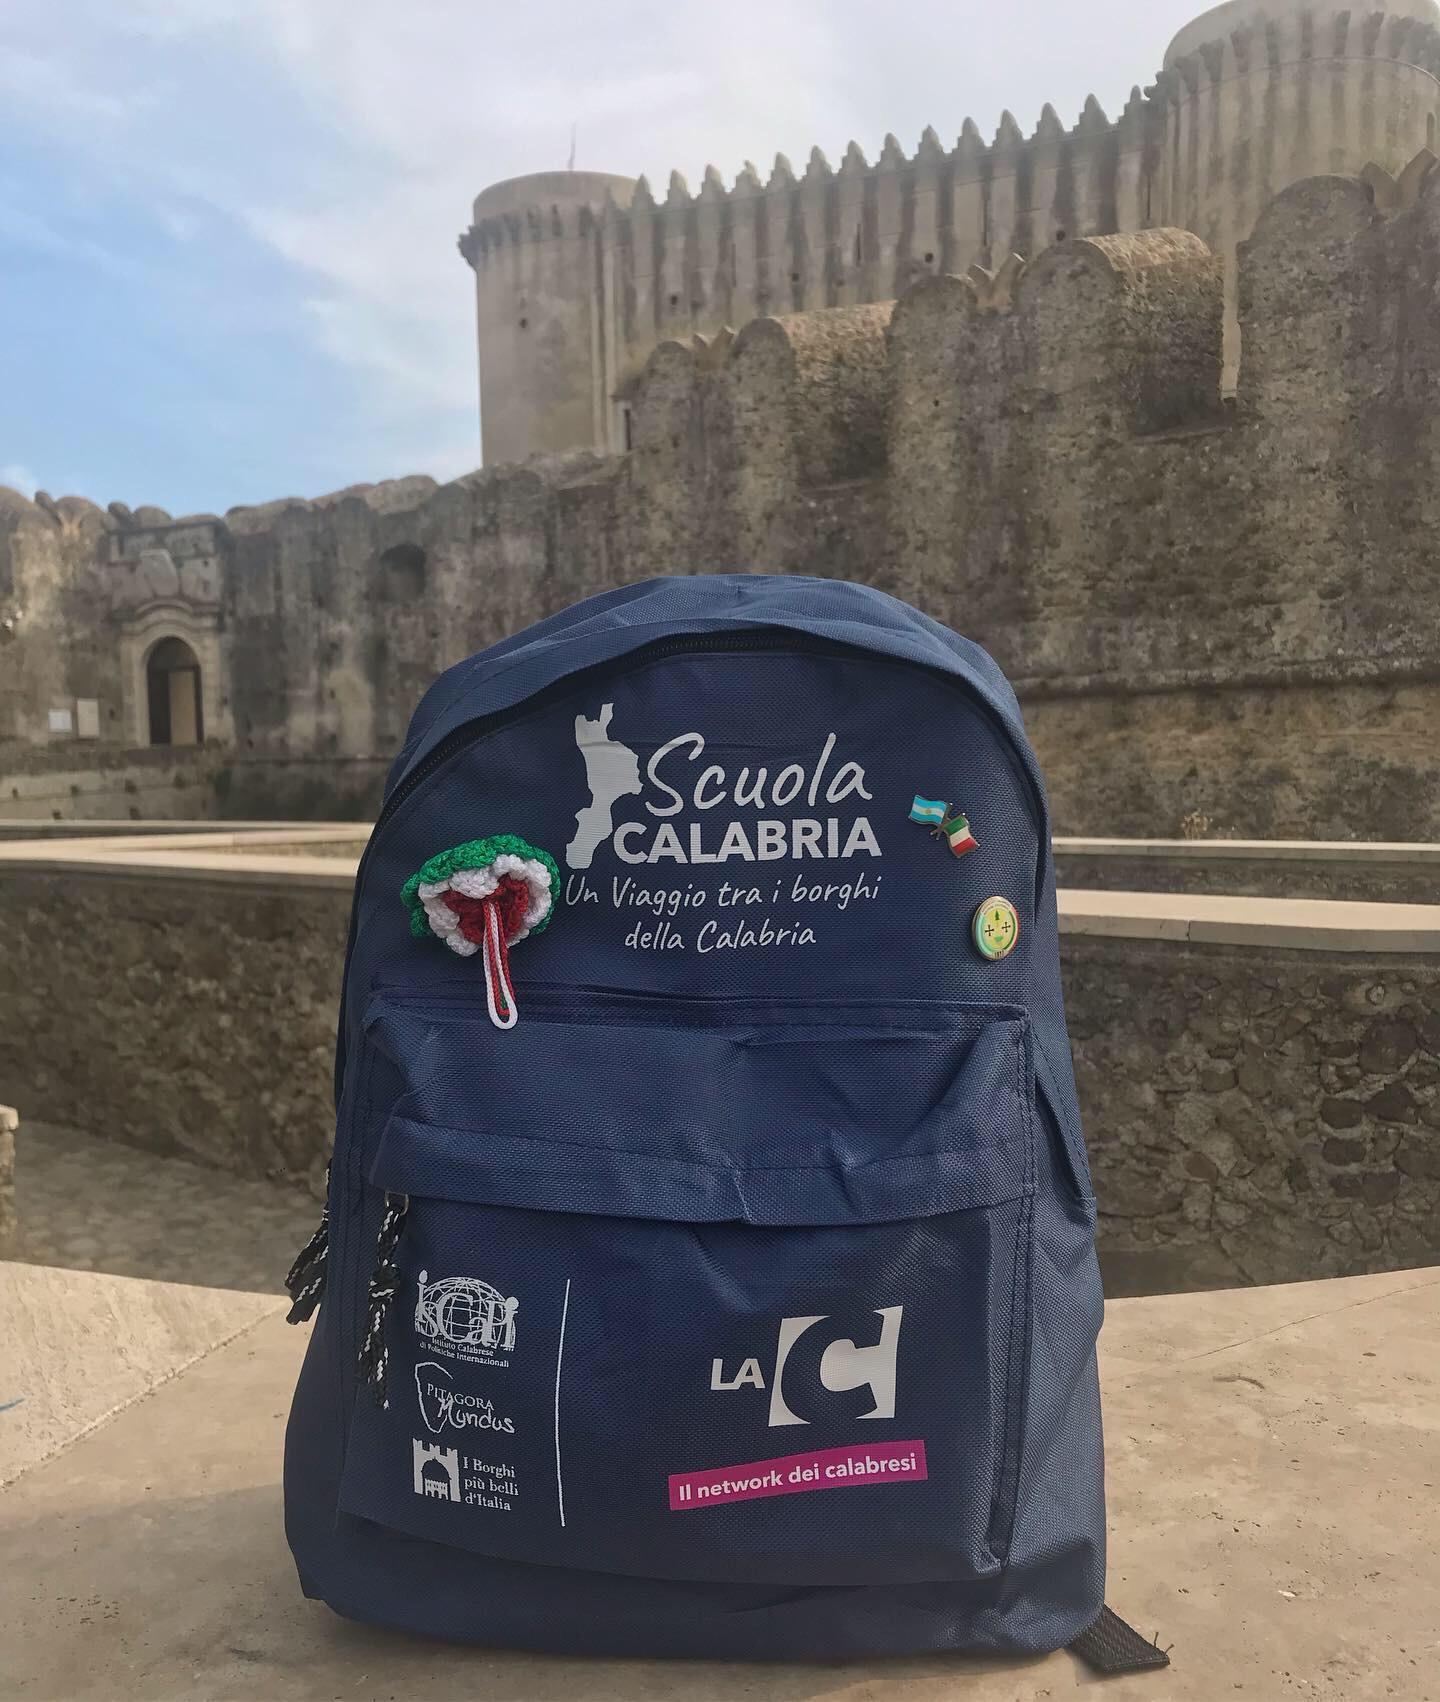 Scuola Calabria Testimonios - Castillo Santa Severina